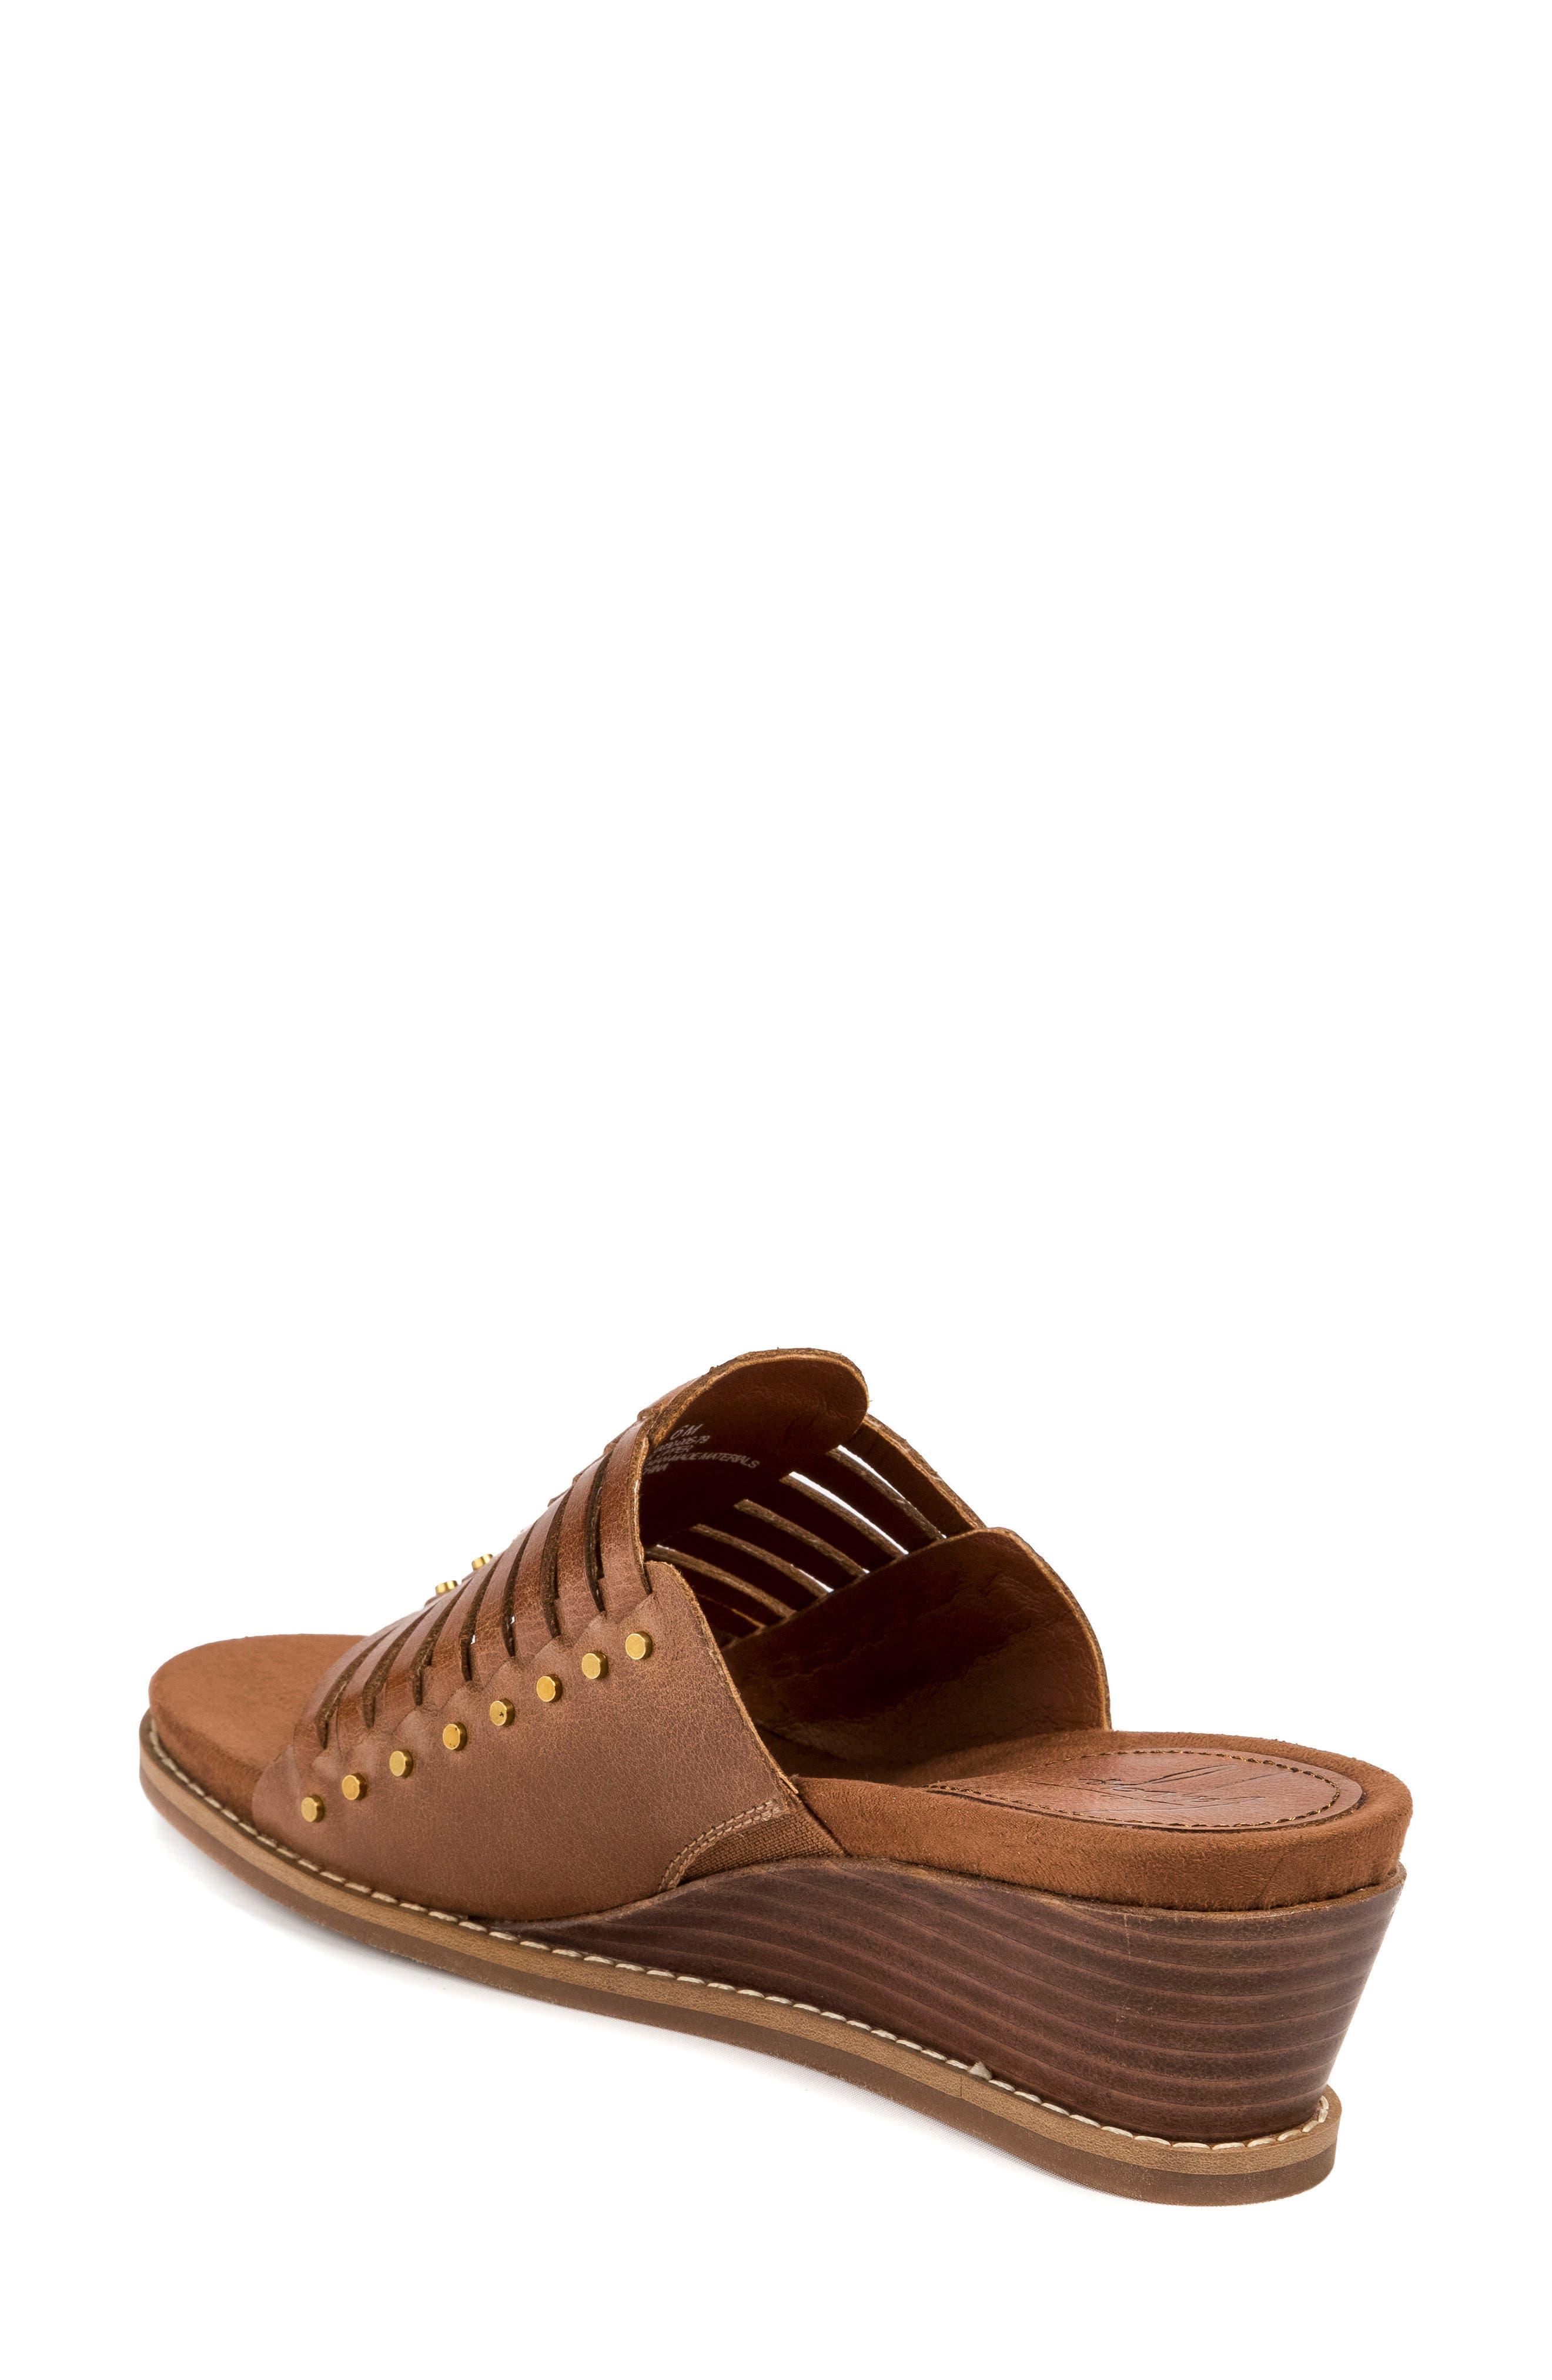 Winnie Wedge Sandal,                             Alternate thumbnail 2, color,                             Brush Brown Leather